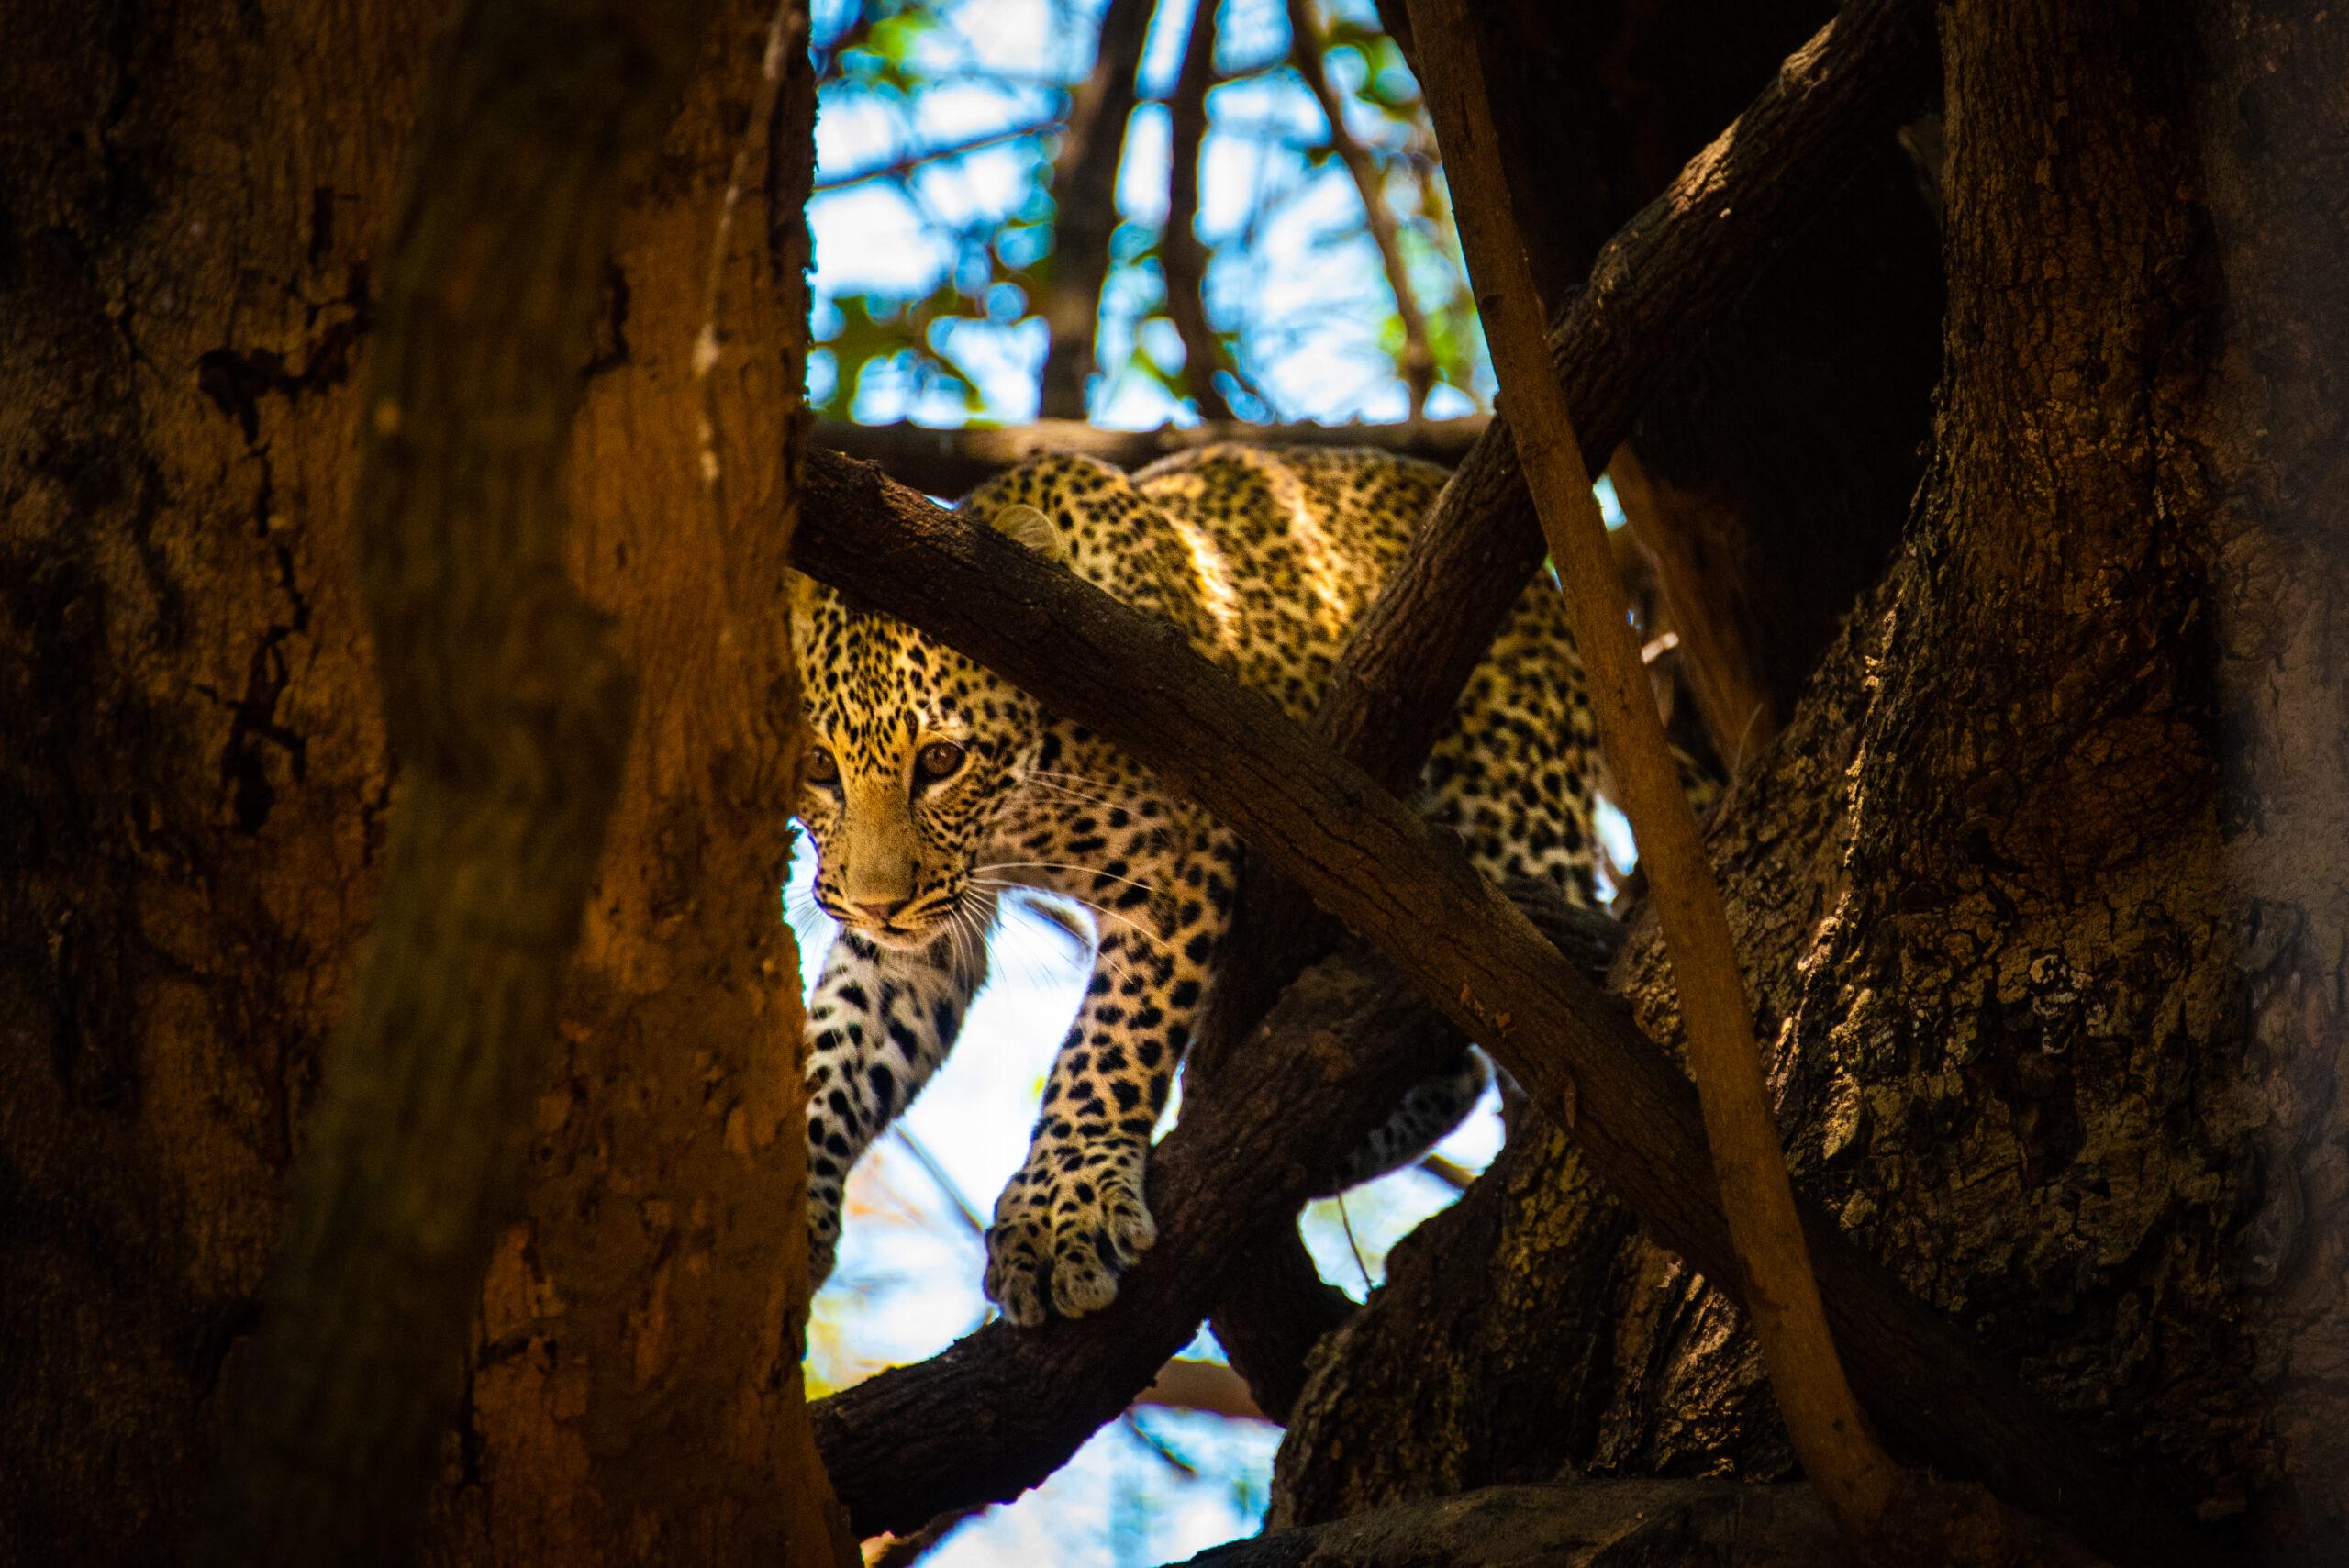 Leopard peering through the tree, exclusive adventures